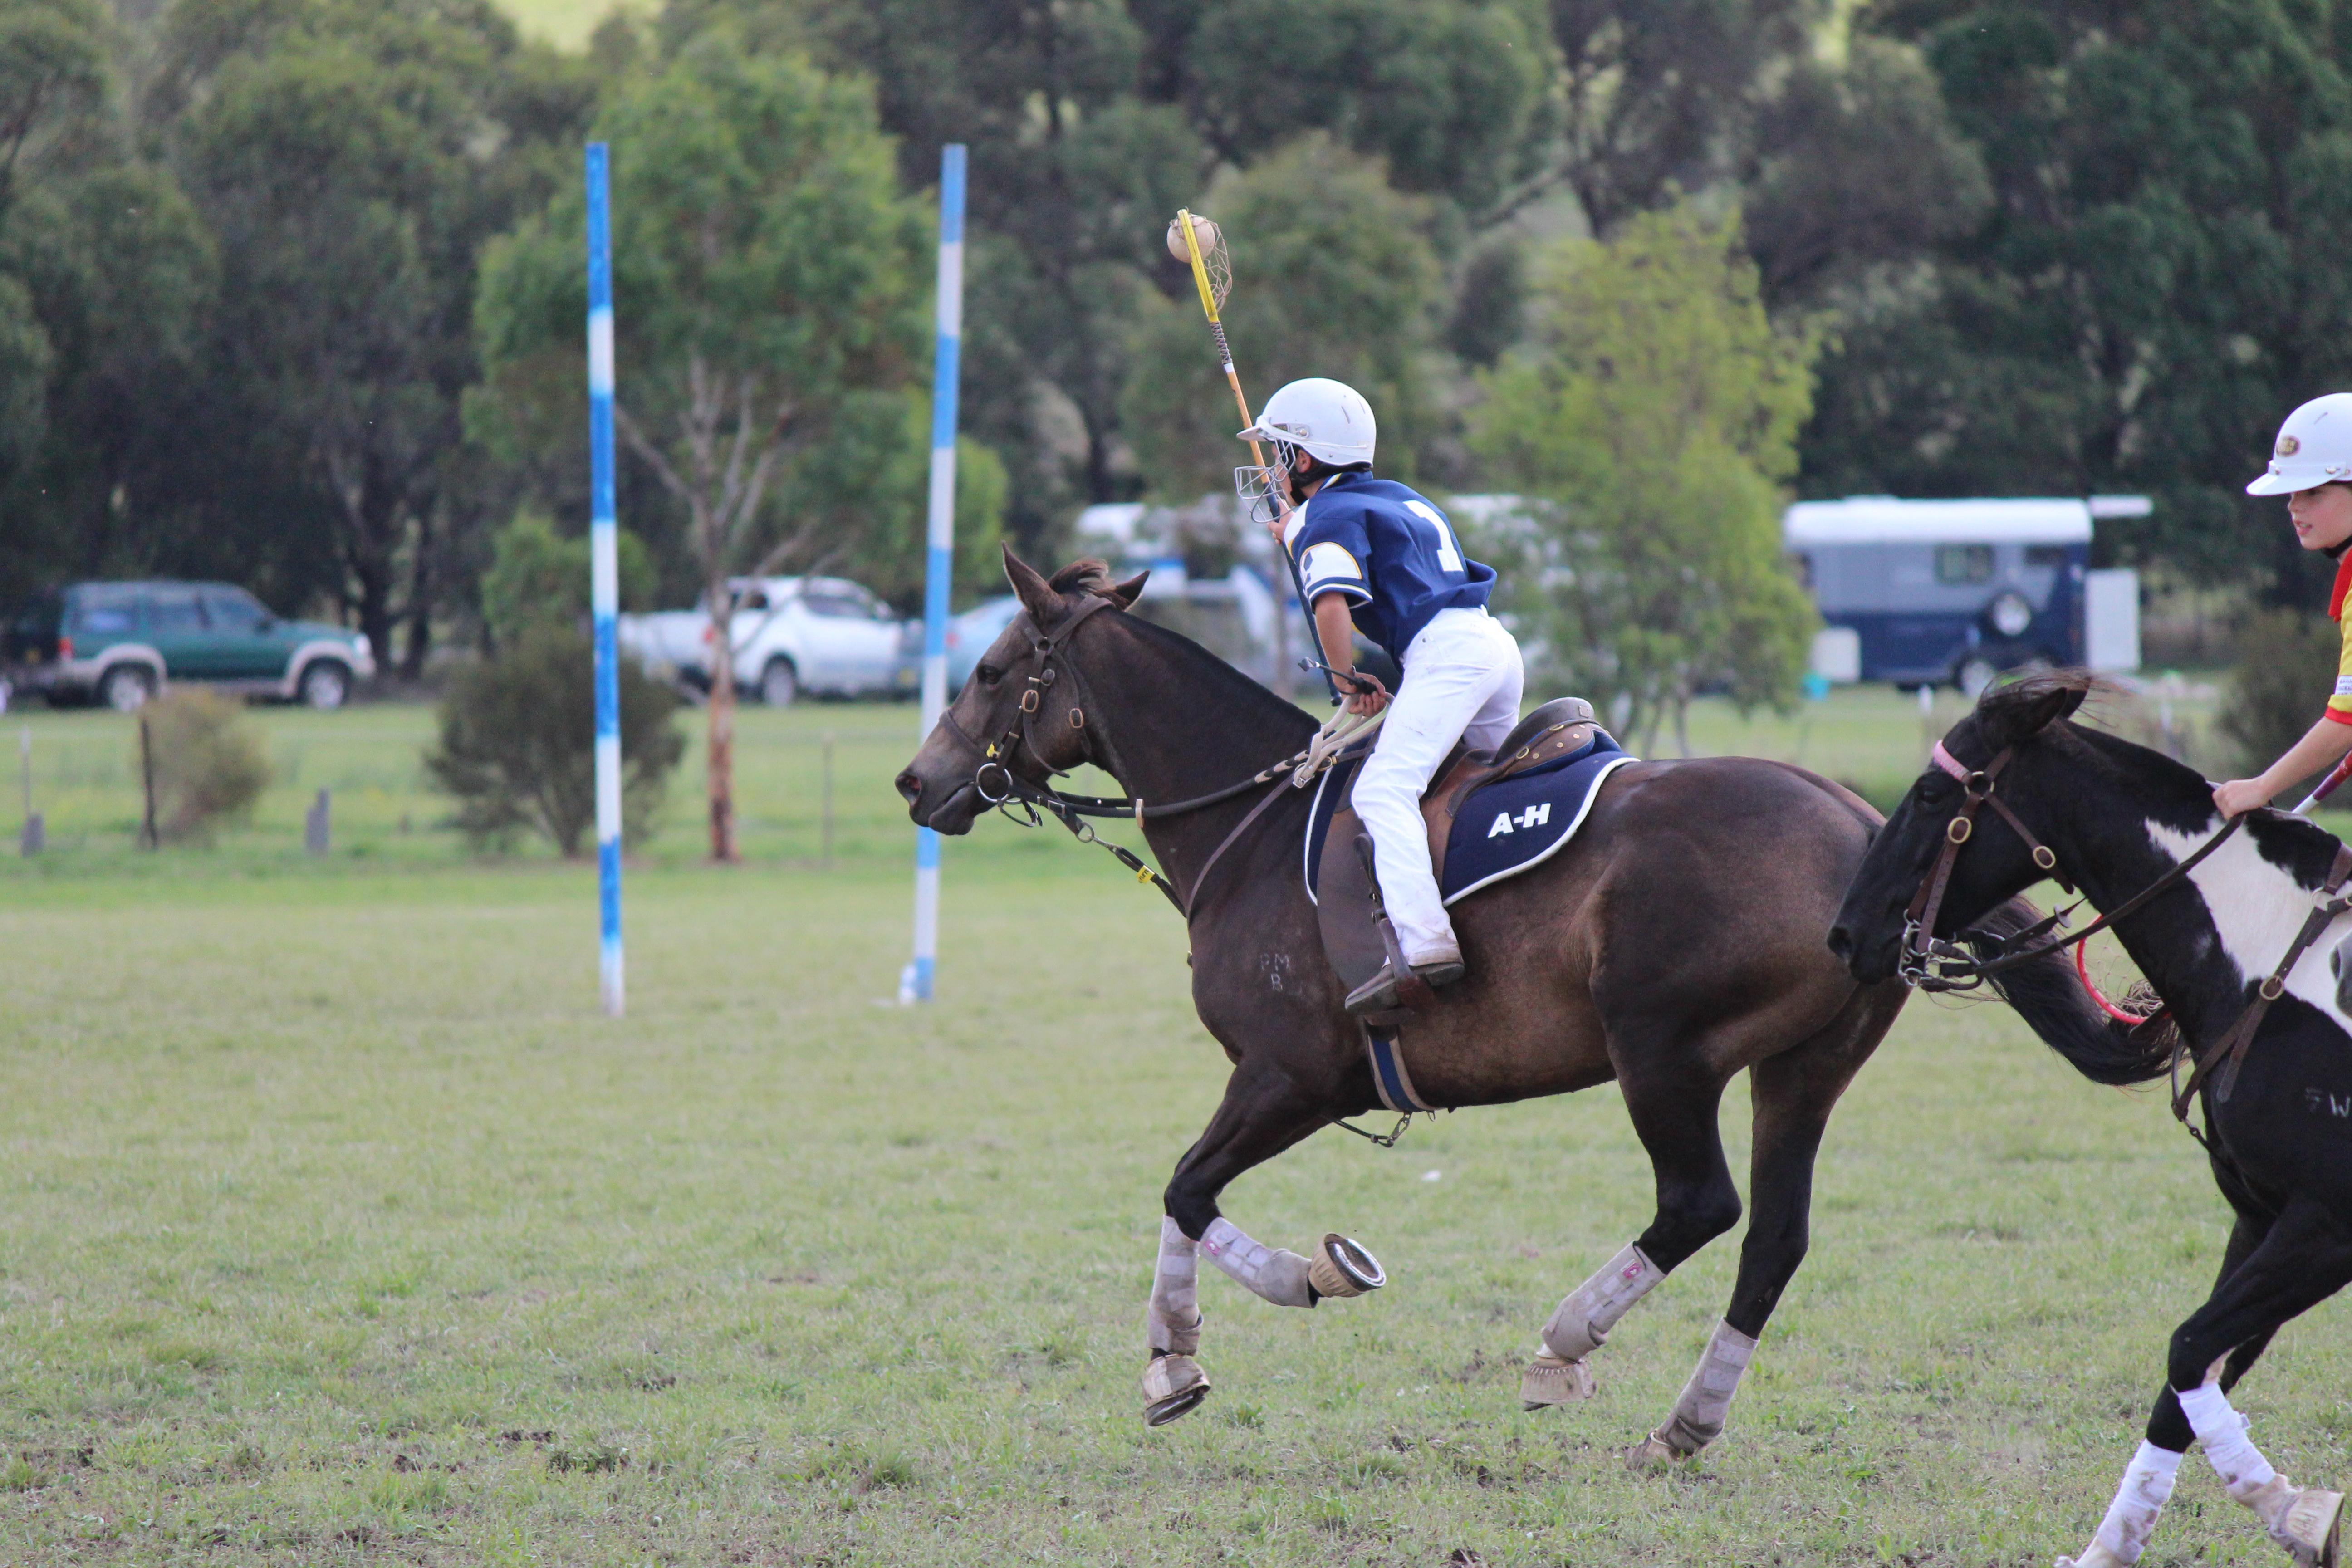 2018 Australian Polocrosse Junior Classic Ah Polocrosse